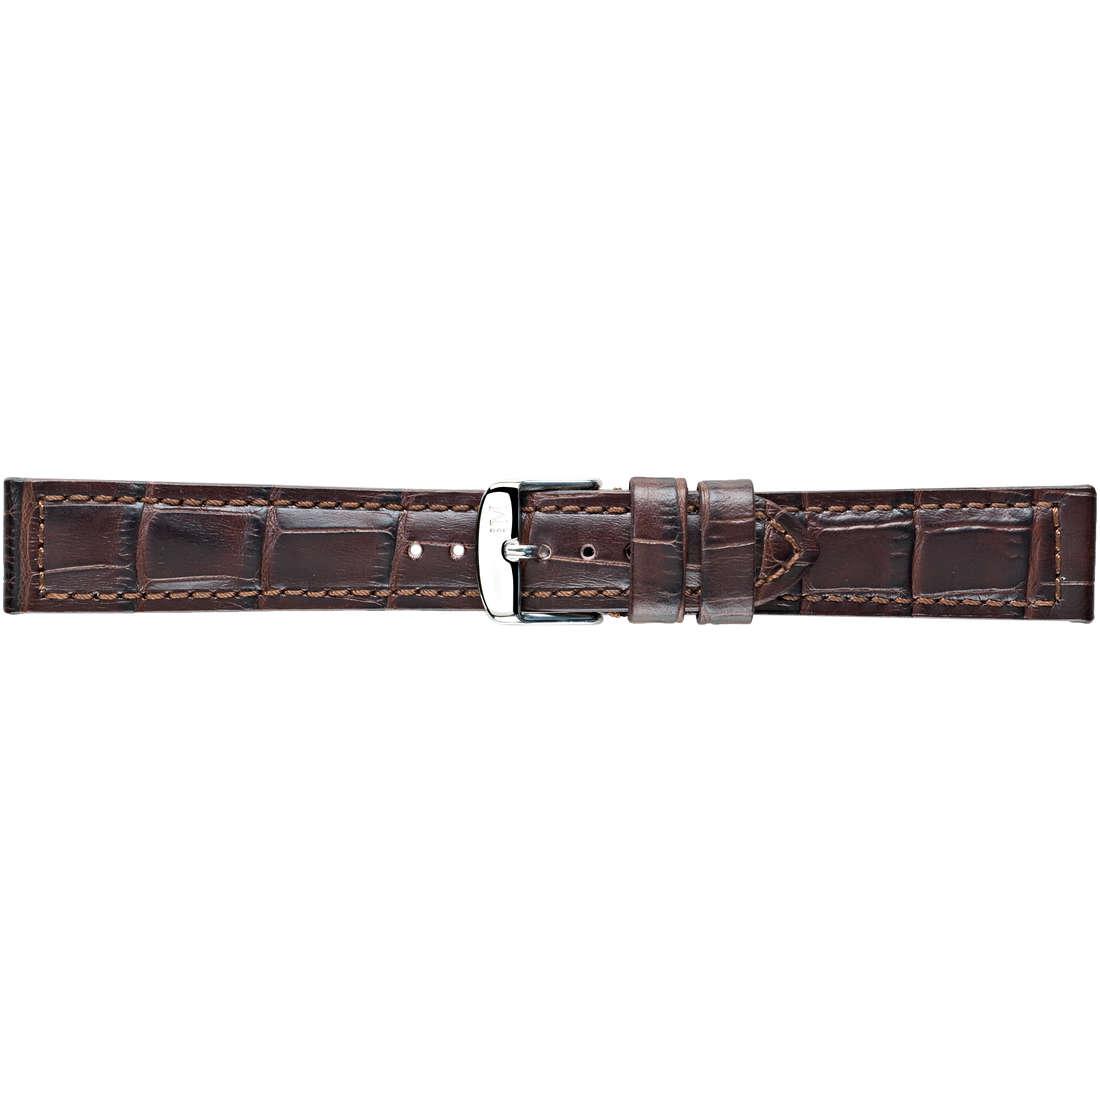 watch watch bands watch straps man Morellato Manufatti A01U2226480032CR20